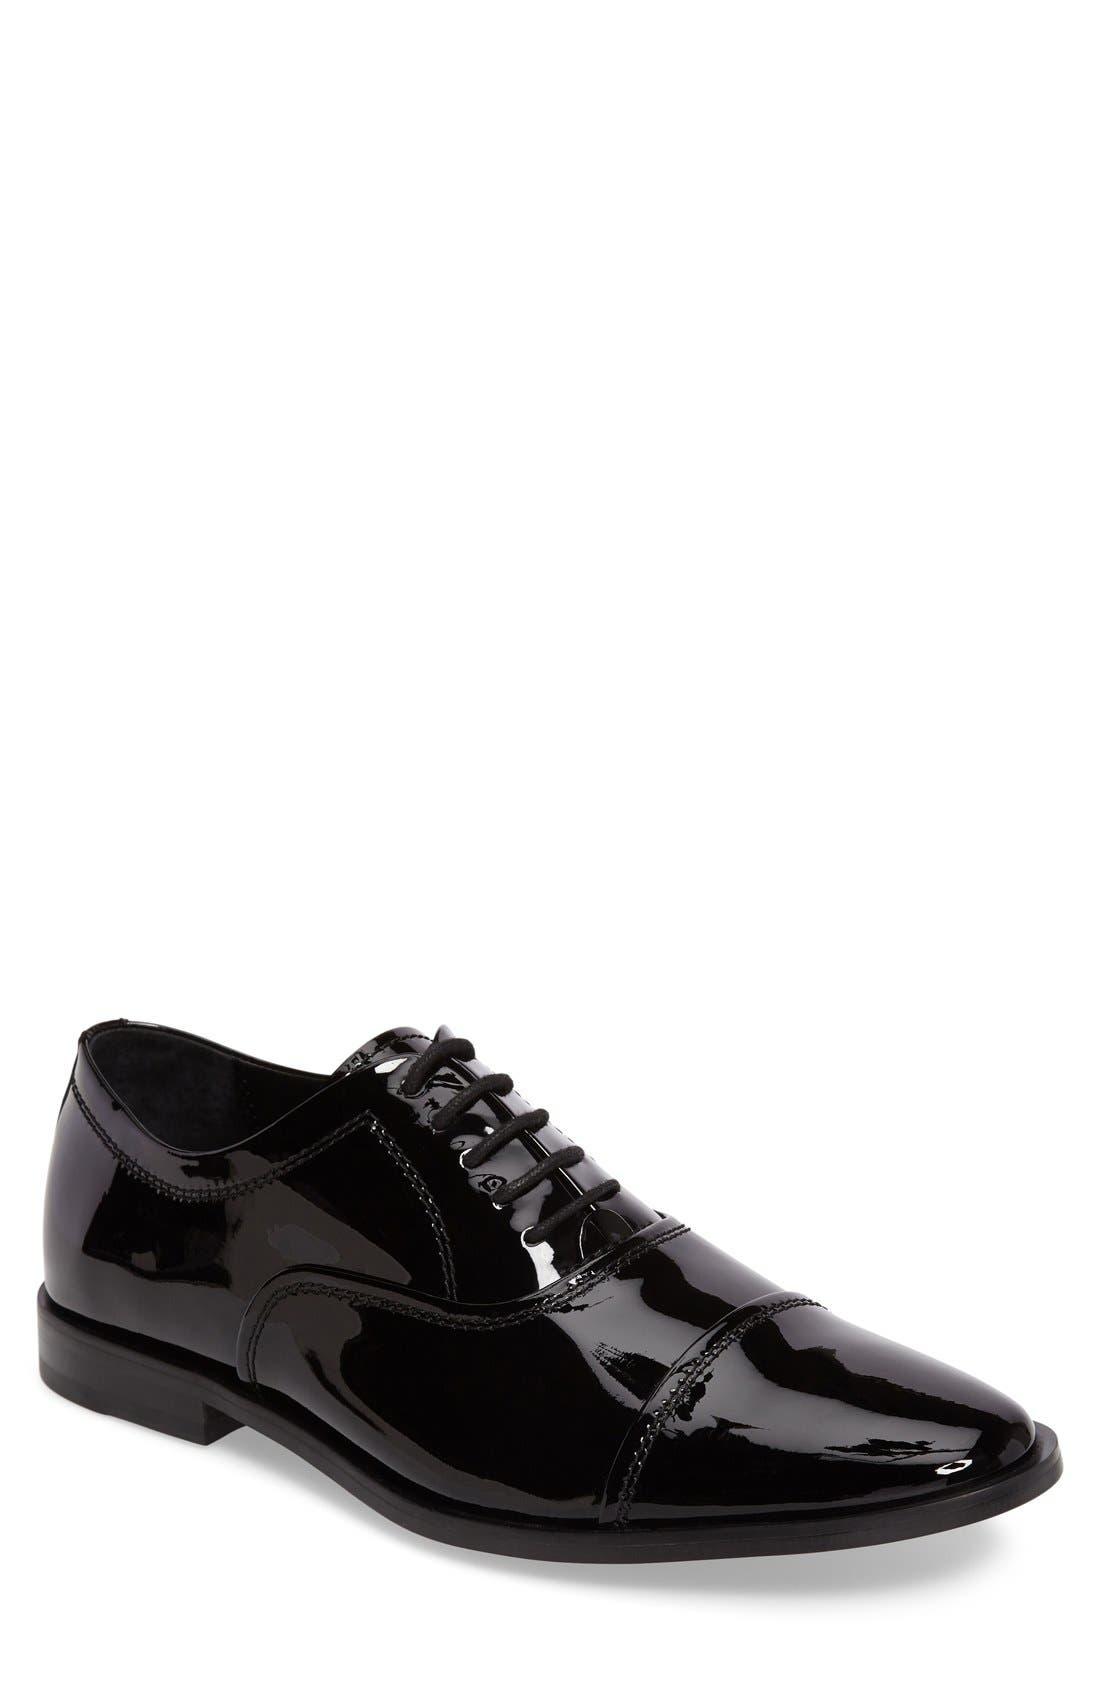 Alternate Image 1 Selected - Calvin Klein 'Nino' Cap Toe Oxford (Men)